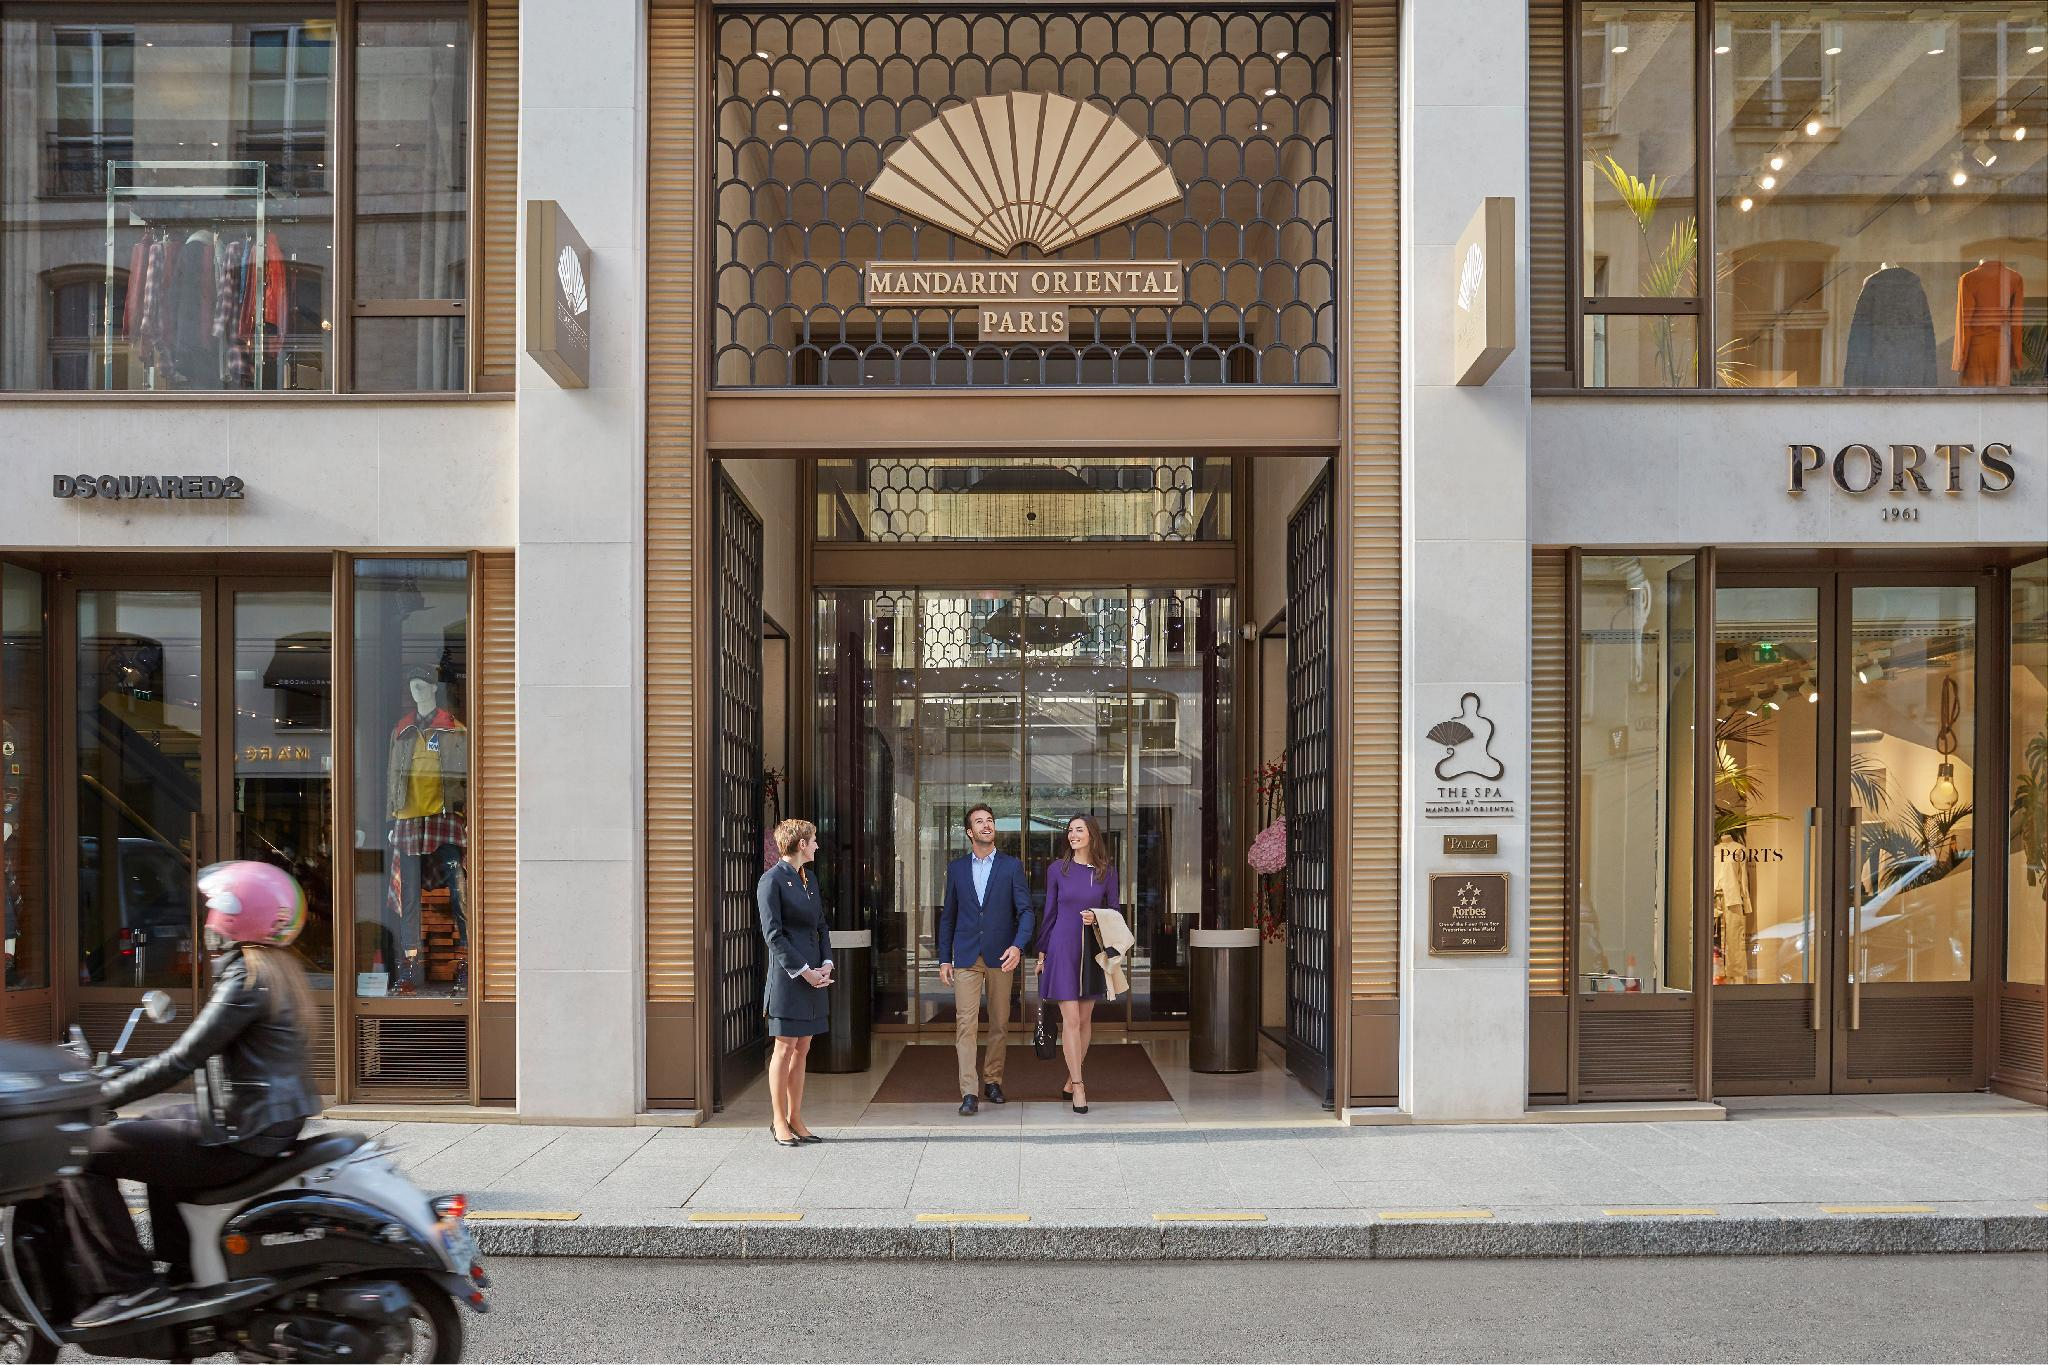 Mandarin Oriental Paris – Paris 3